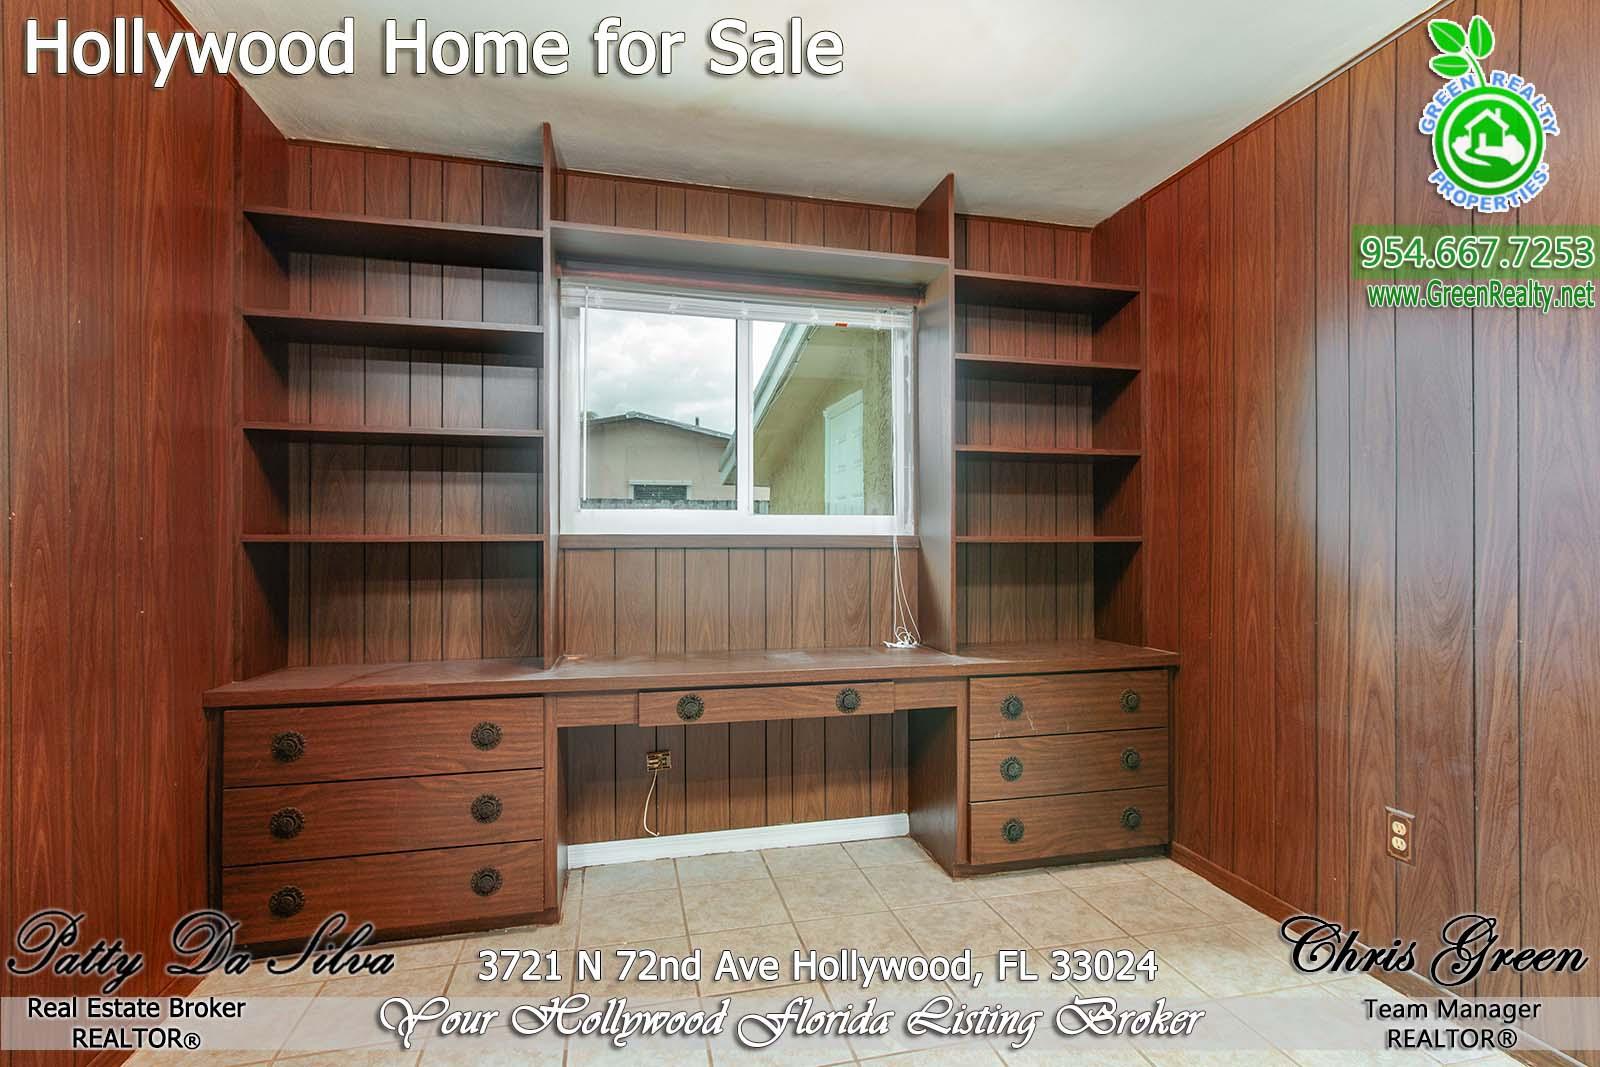 17 Hollywood Florida Real Estate Listing Patty Da Silva Green Realty properties (16)